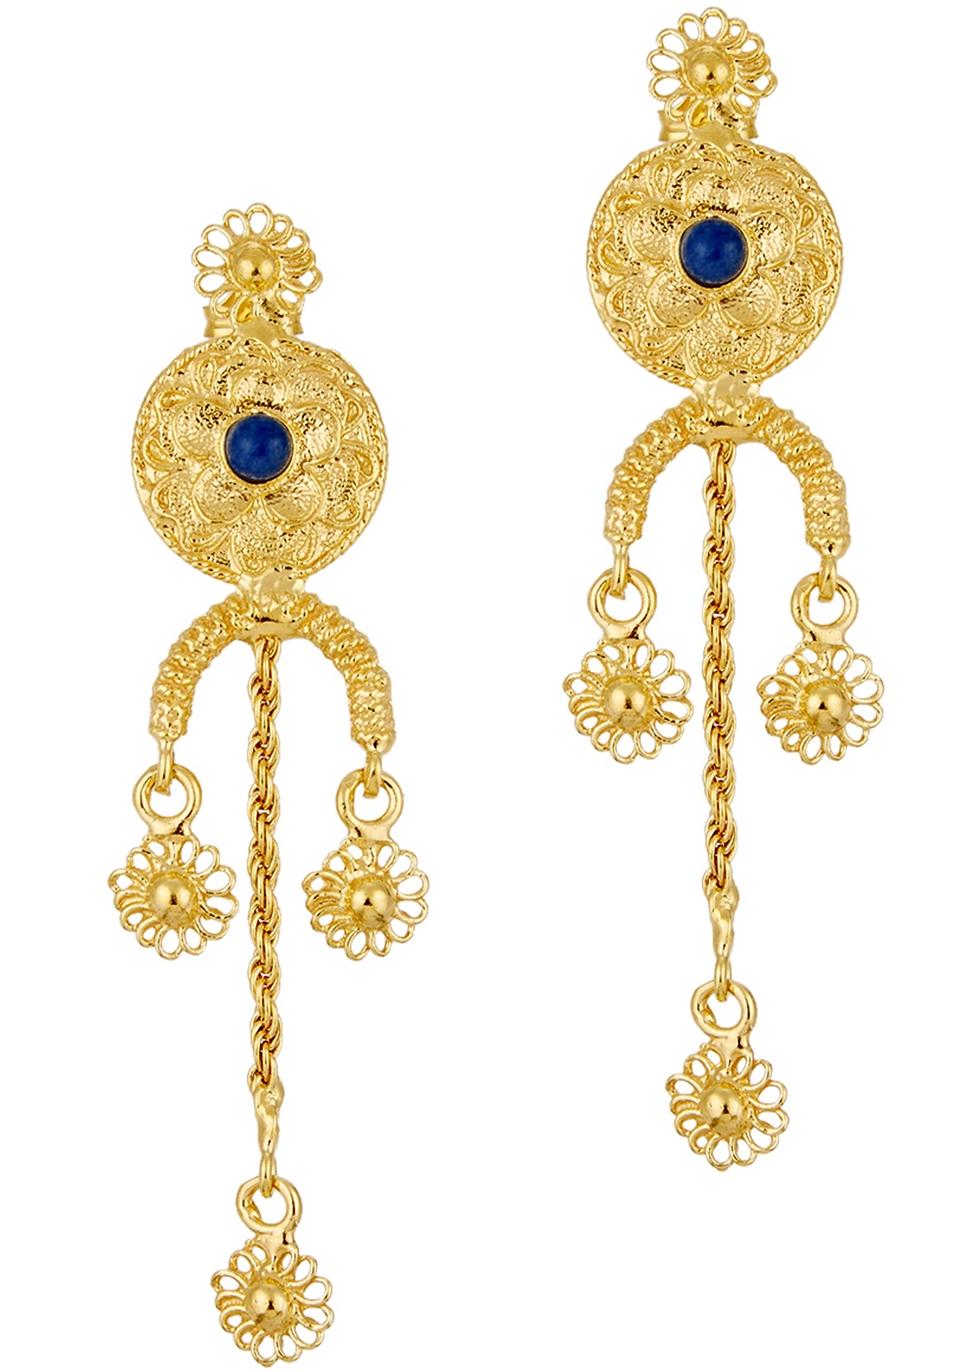 SORU JEWELLERY TREASURES 18CT GOLD-PLATED DROP EARRINGS